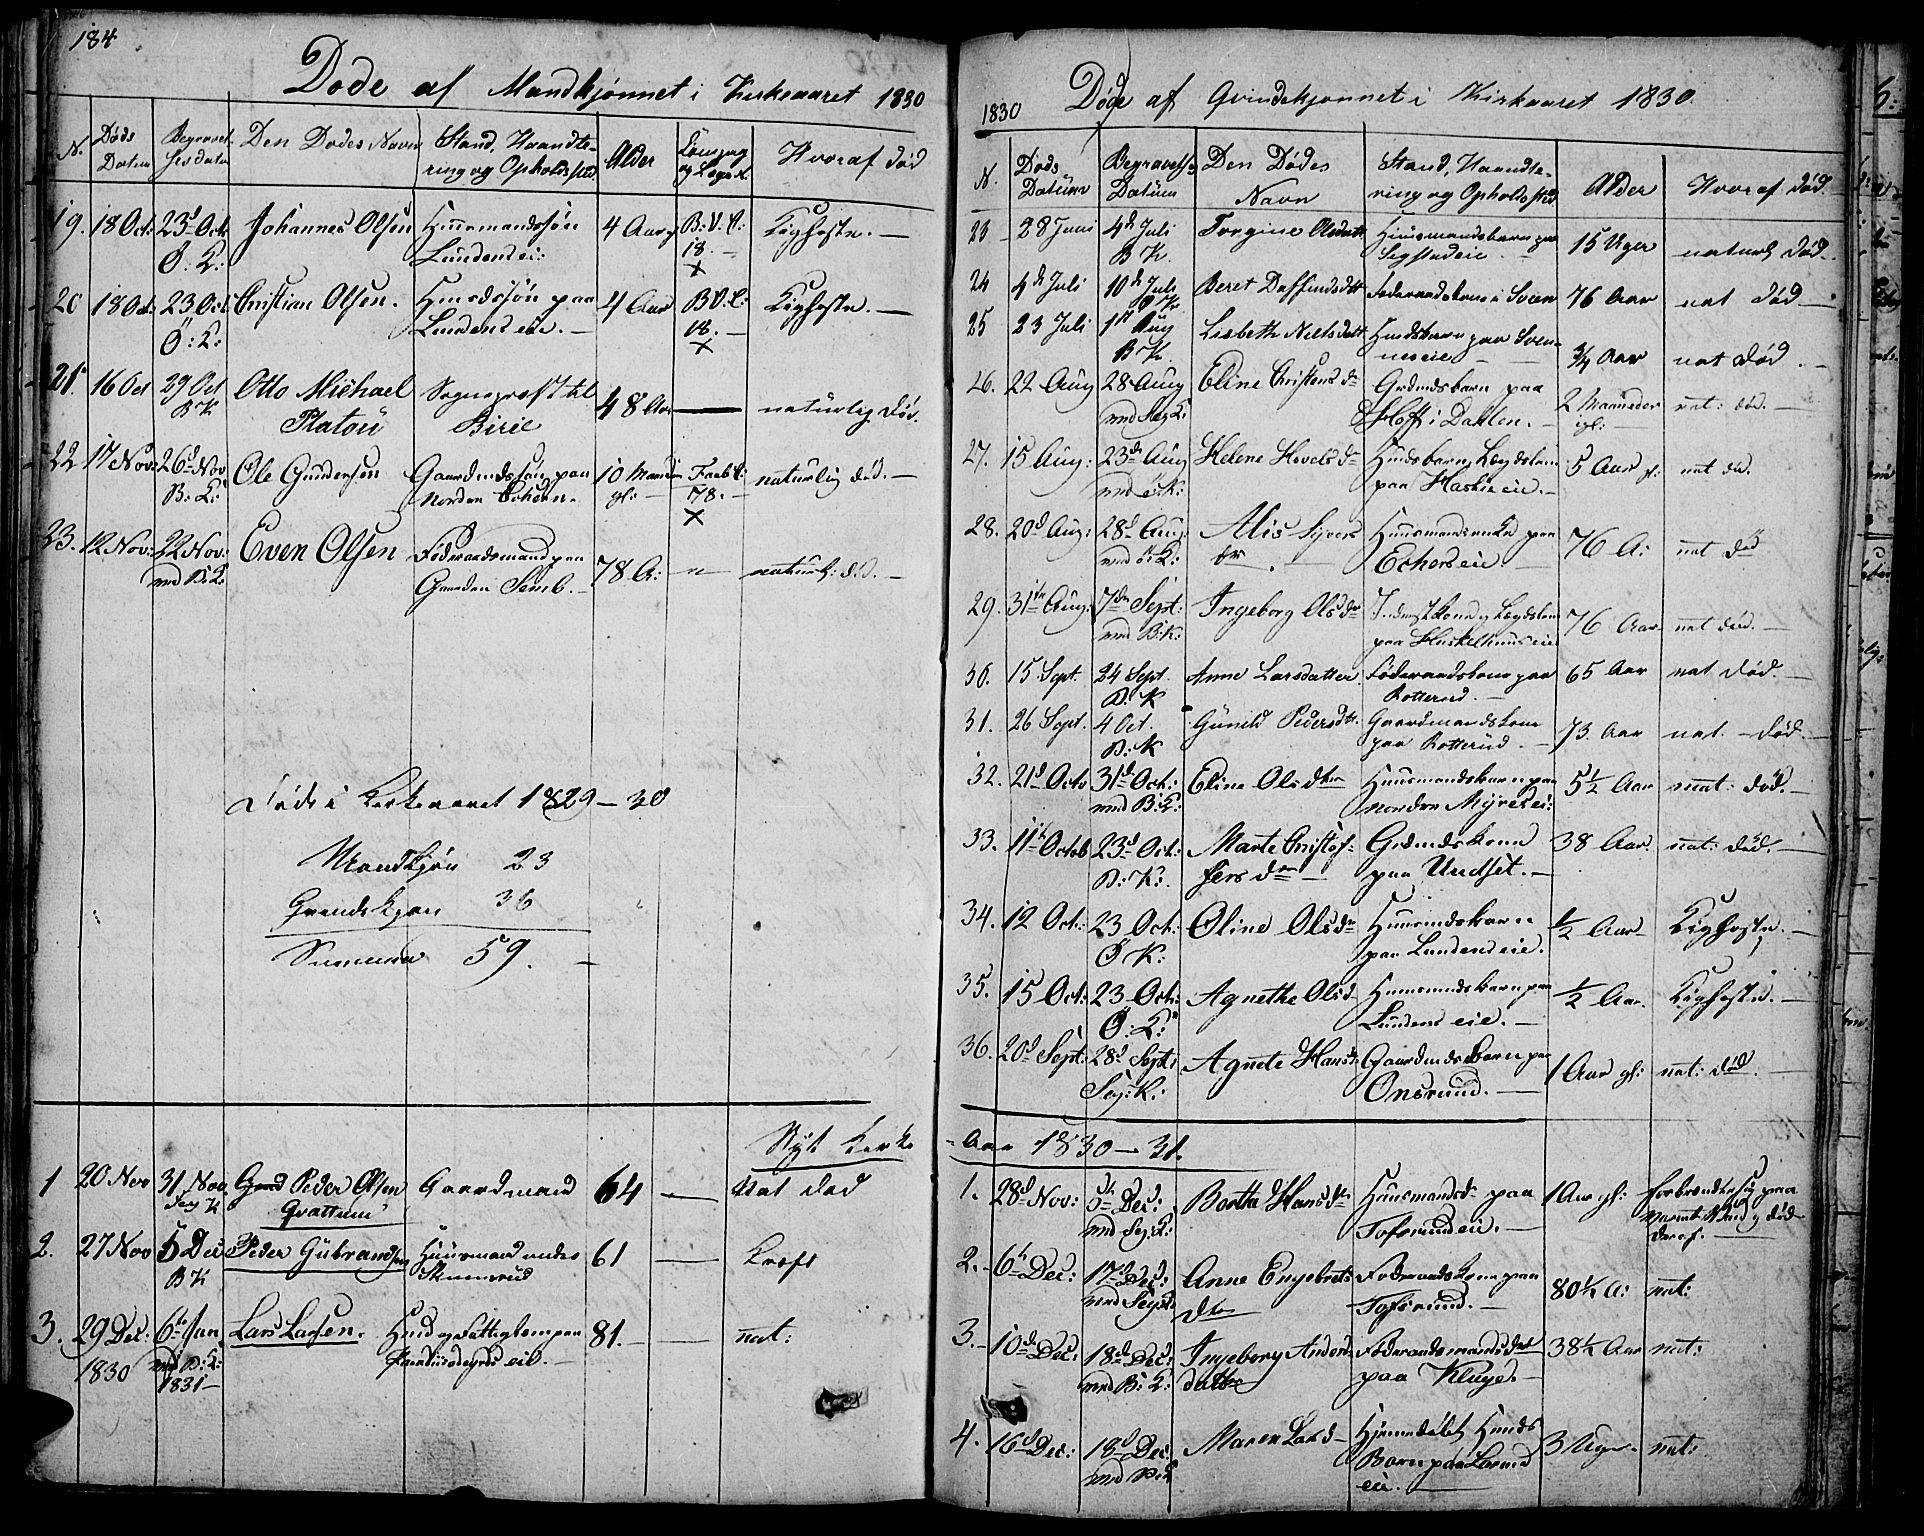 SAH, Biri prestekontor, Ministerialbok nr. 4, 1829-1842, s. 184